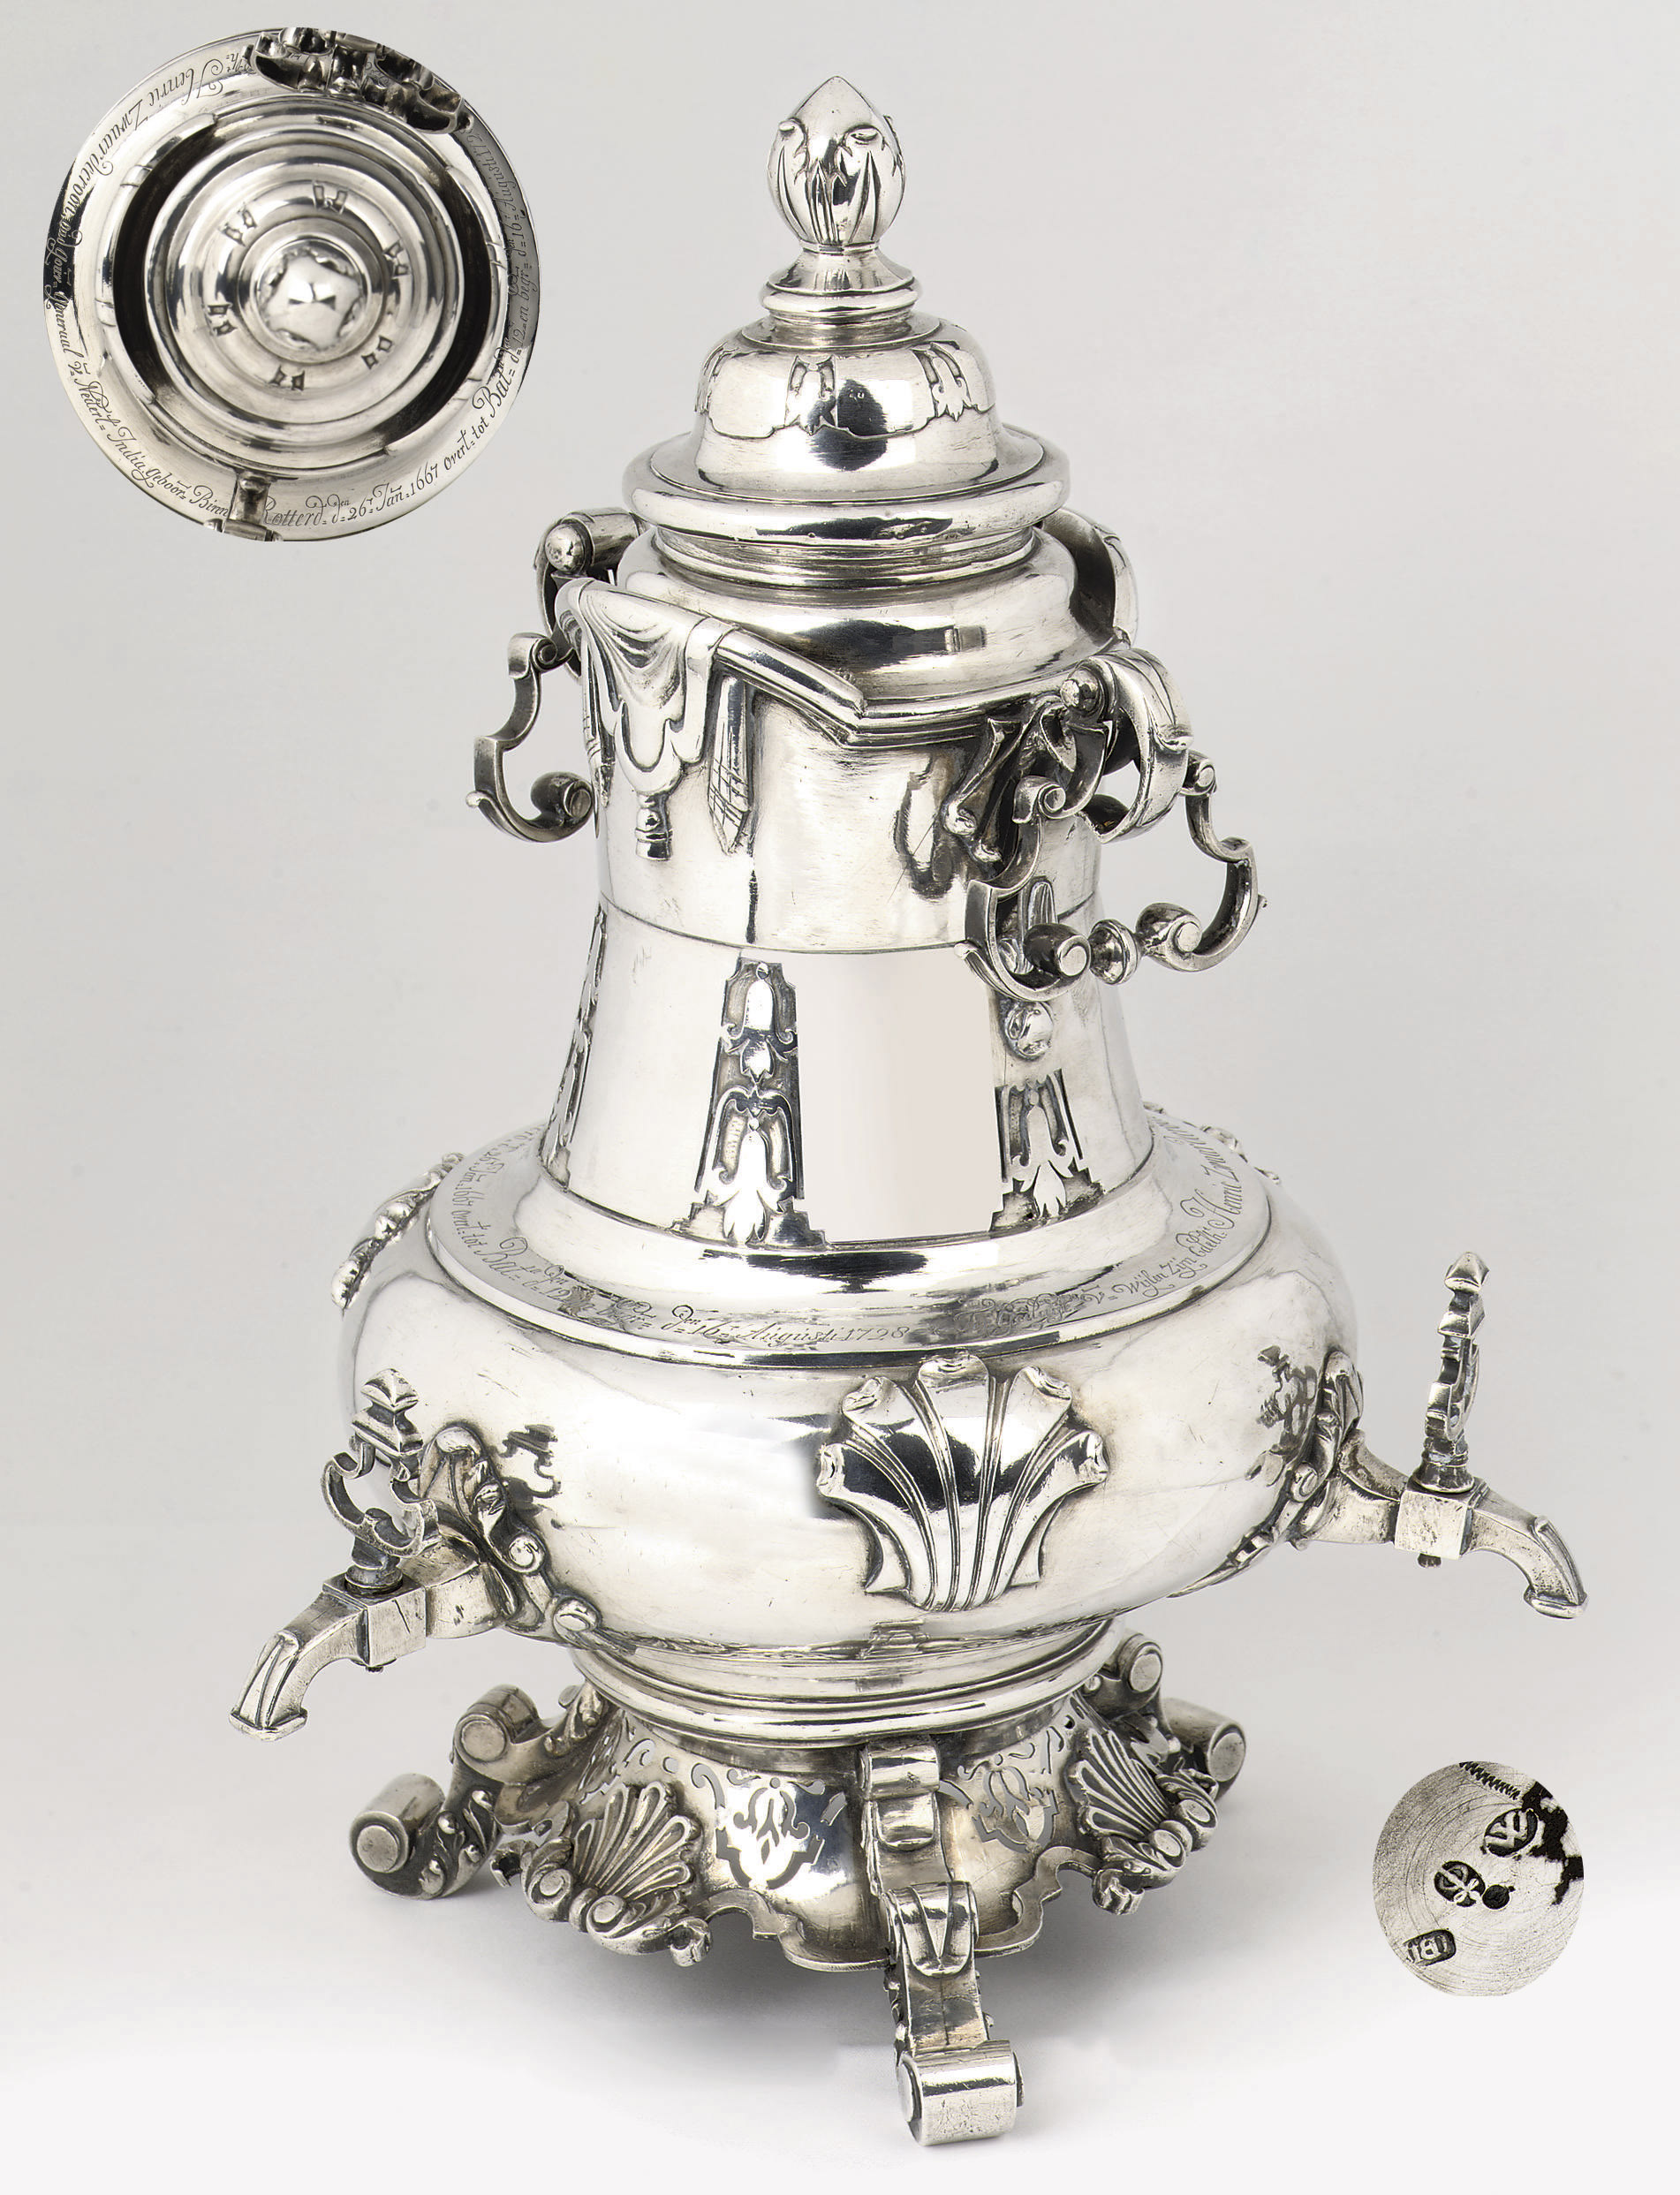 A Dutch colonial silver coffee